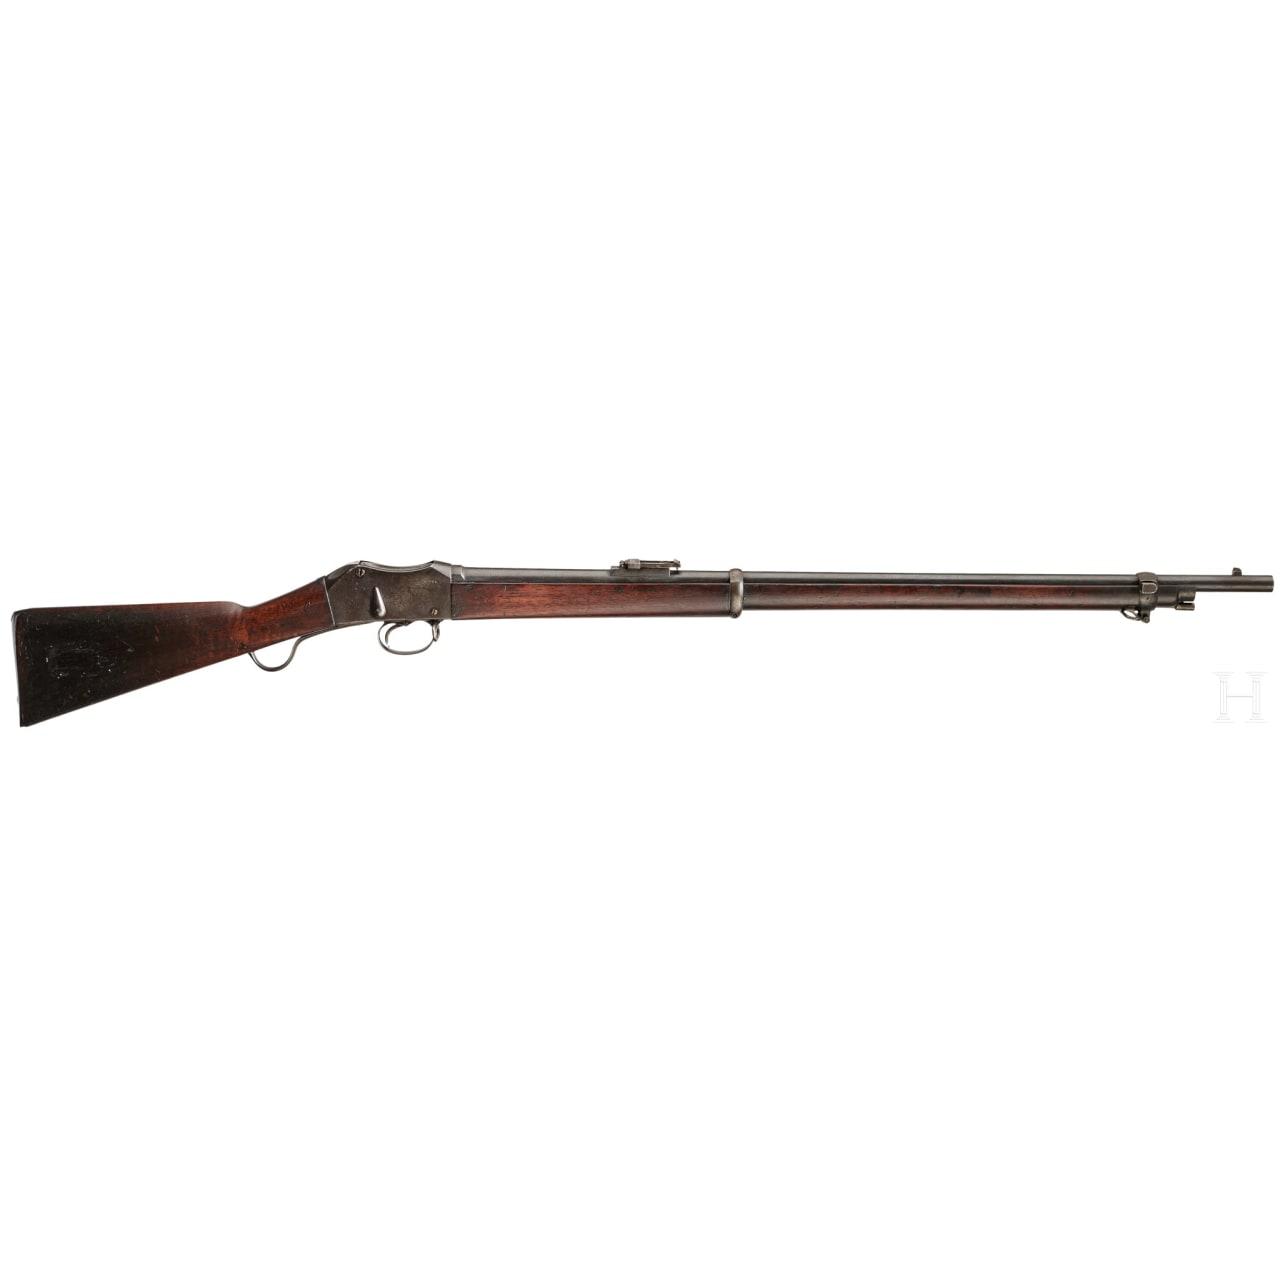 Martini-Henry Rifle Steyr 1880, Portugal (?)